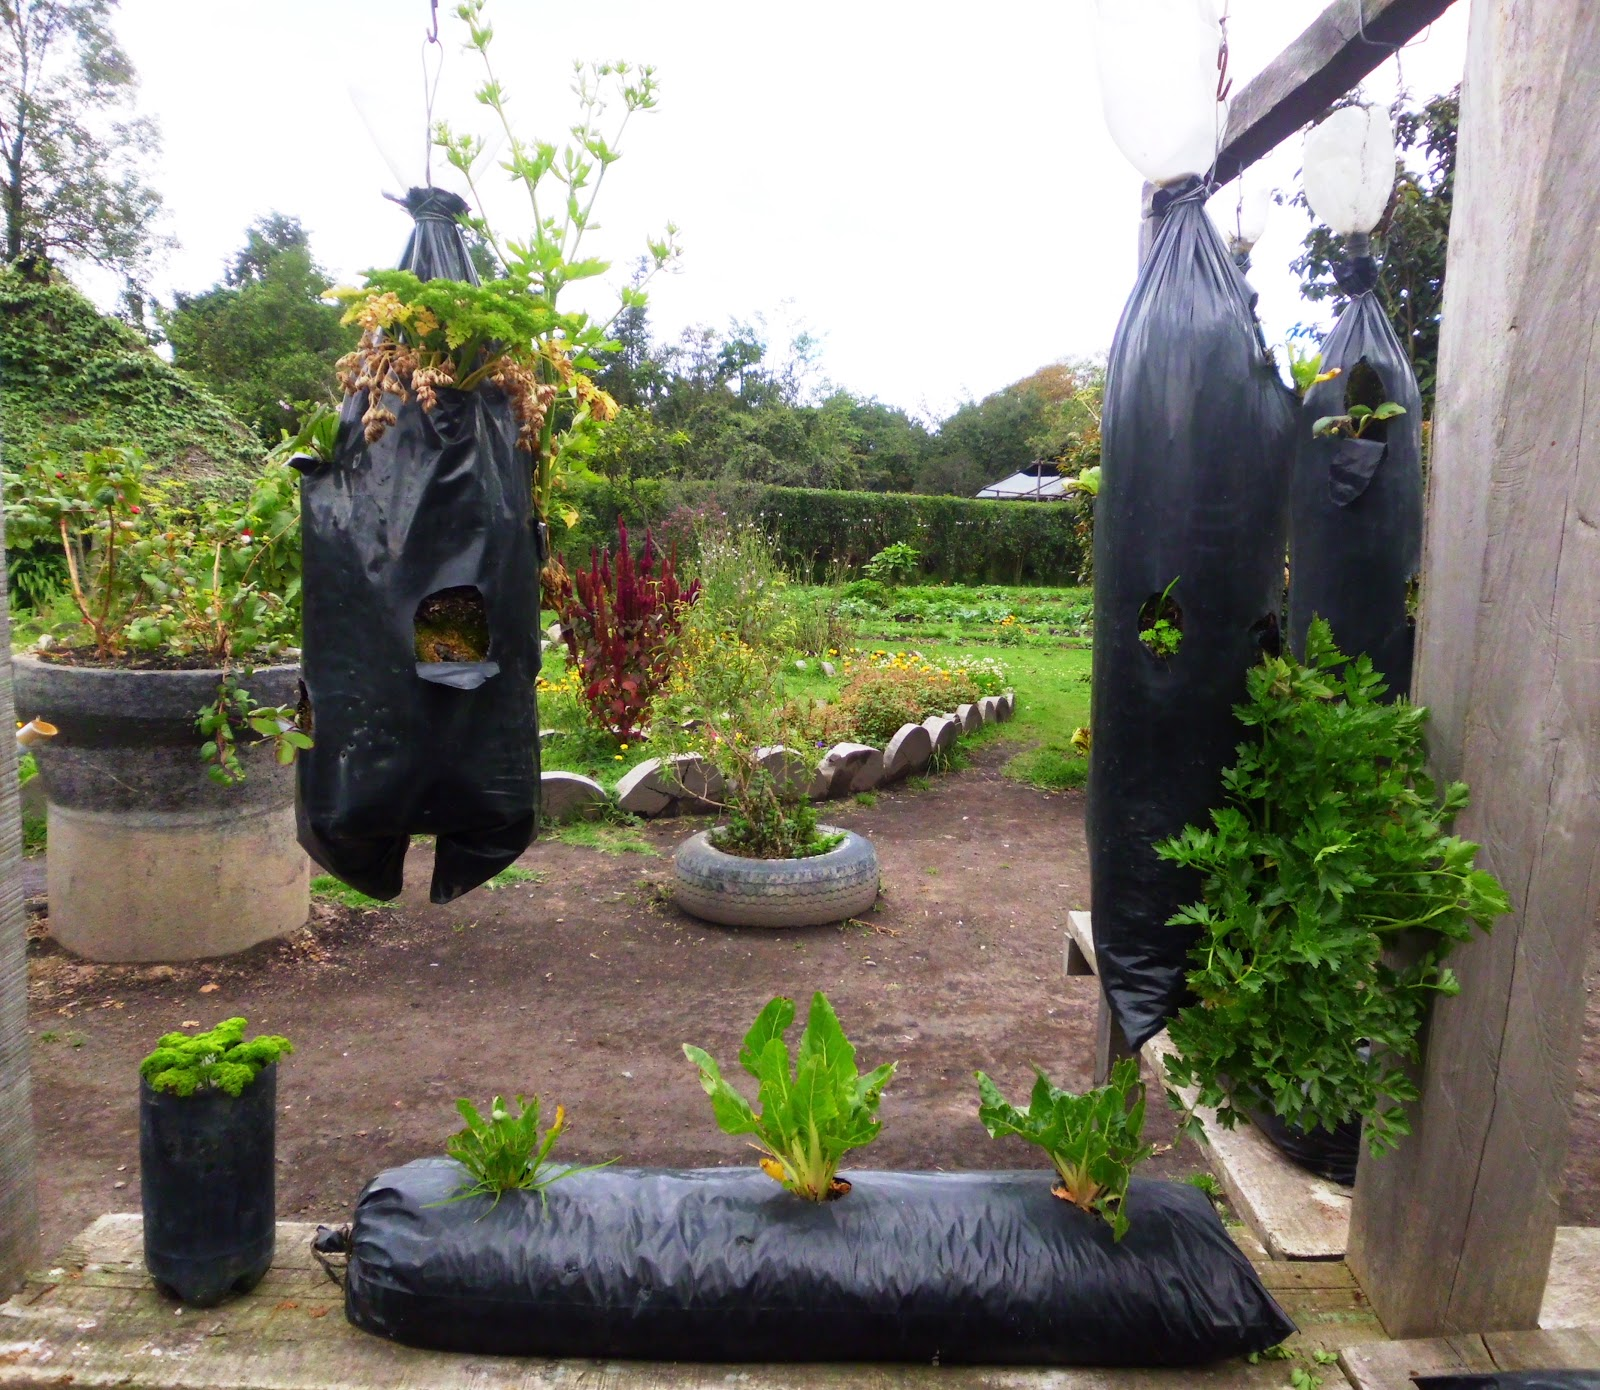 El jardin de c ndida c mo cultivar hortalizas org nicas for Como cultivar hortalizas